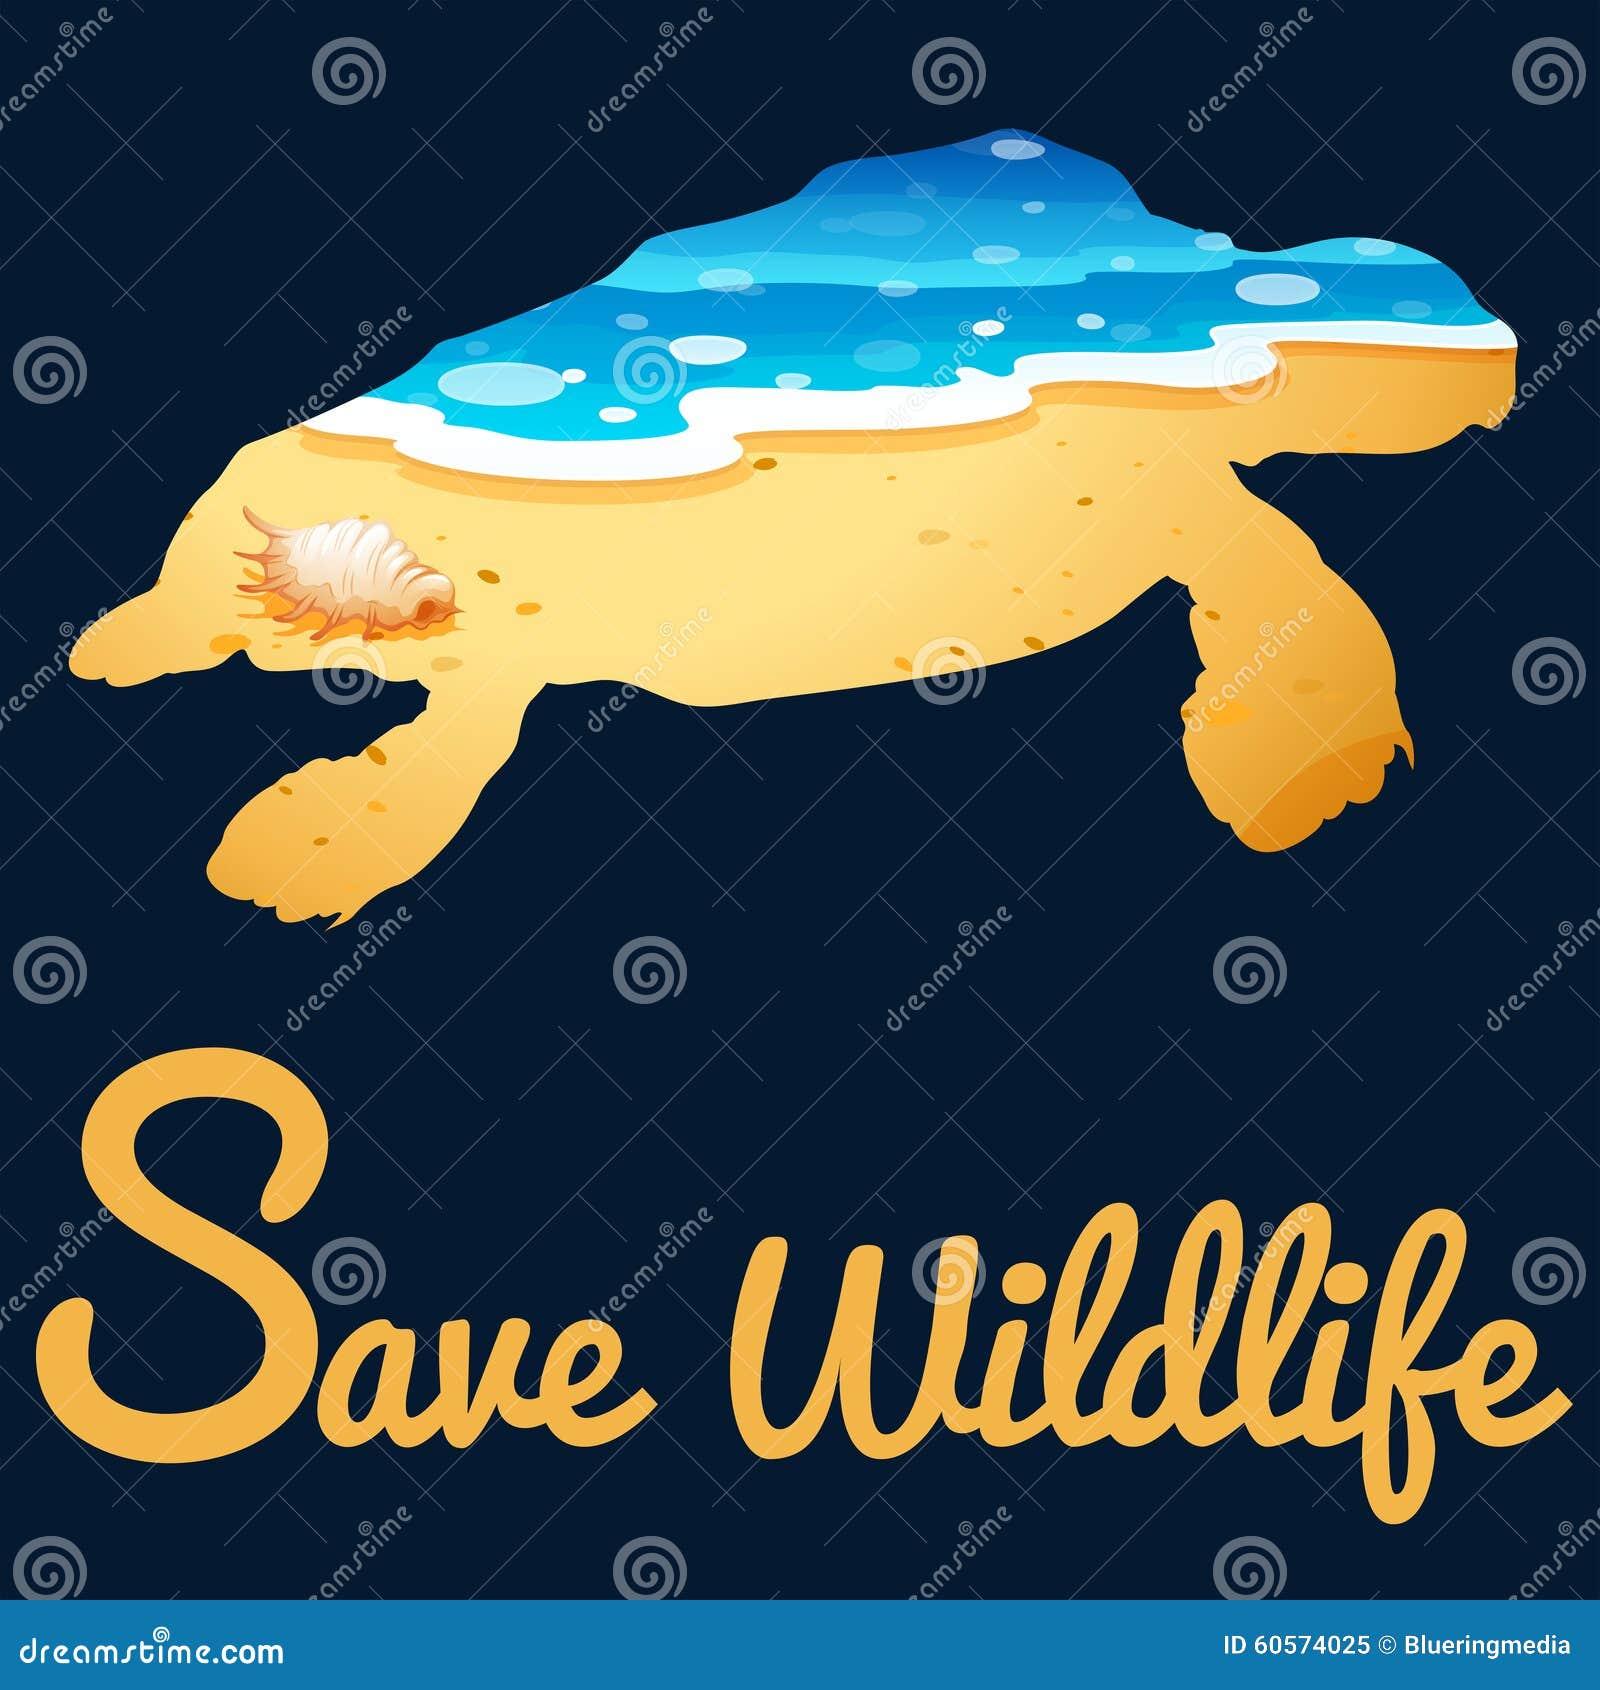 save wildlife poster with sea turtle stock illustration tortoise clipart black tortoise clipart mask